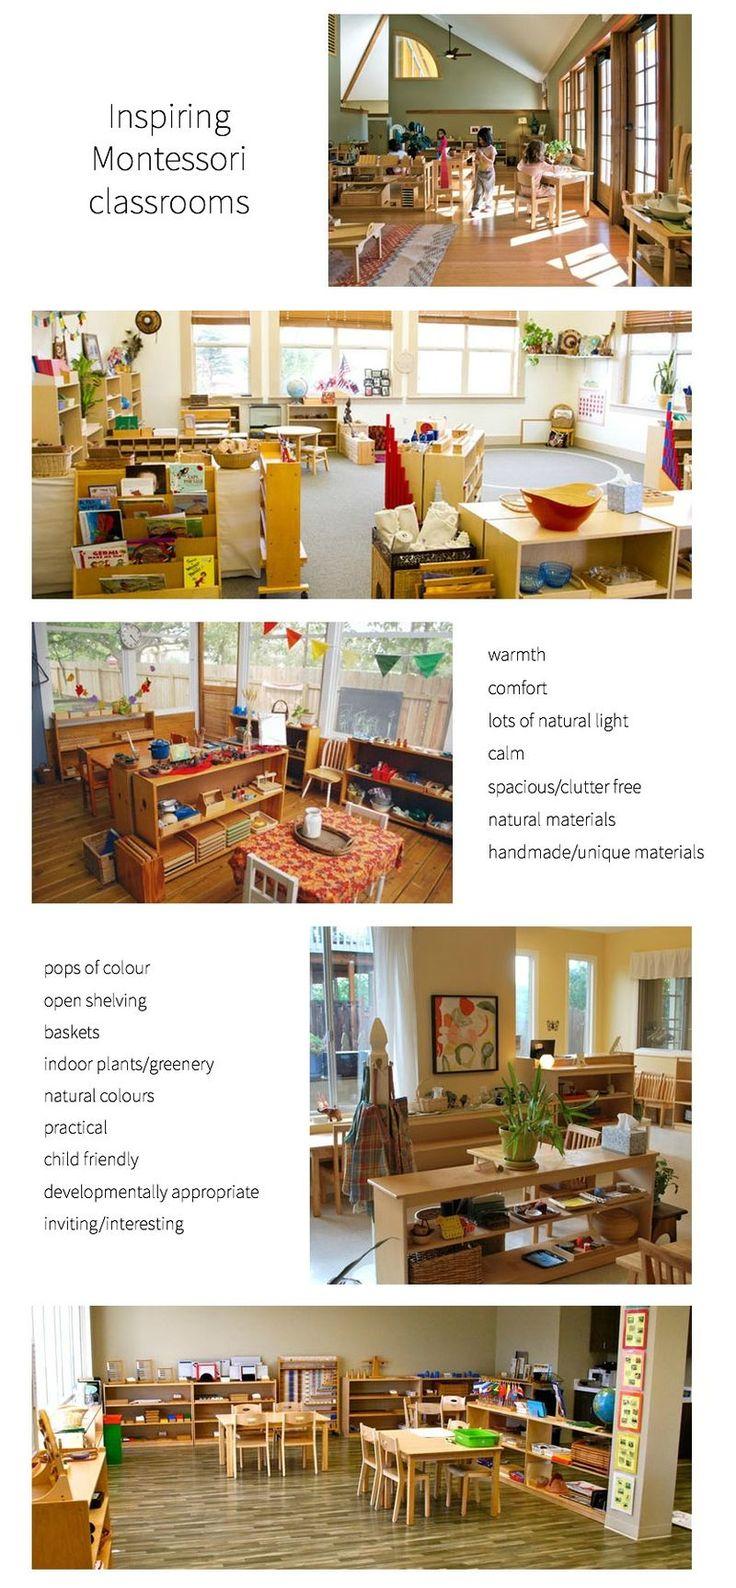 Inspirer Montessori salles de classe